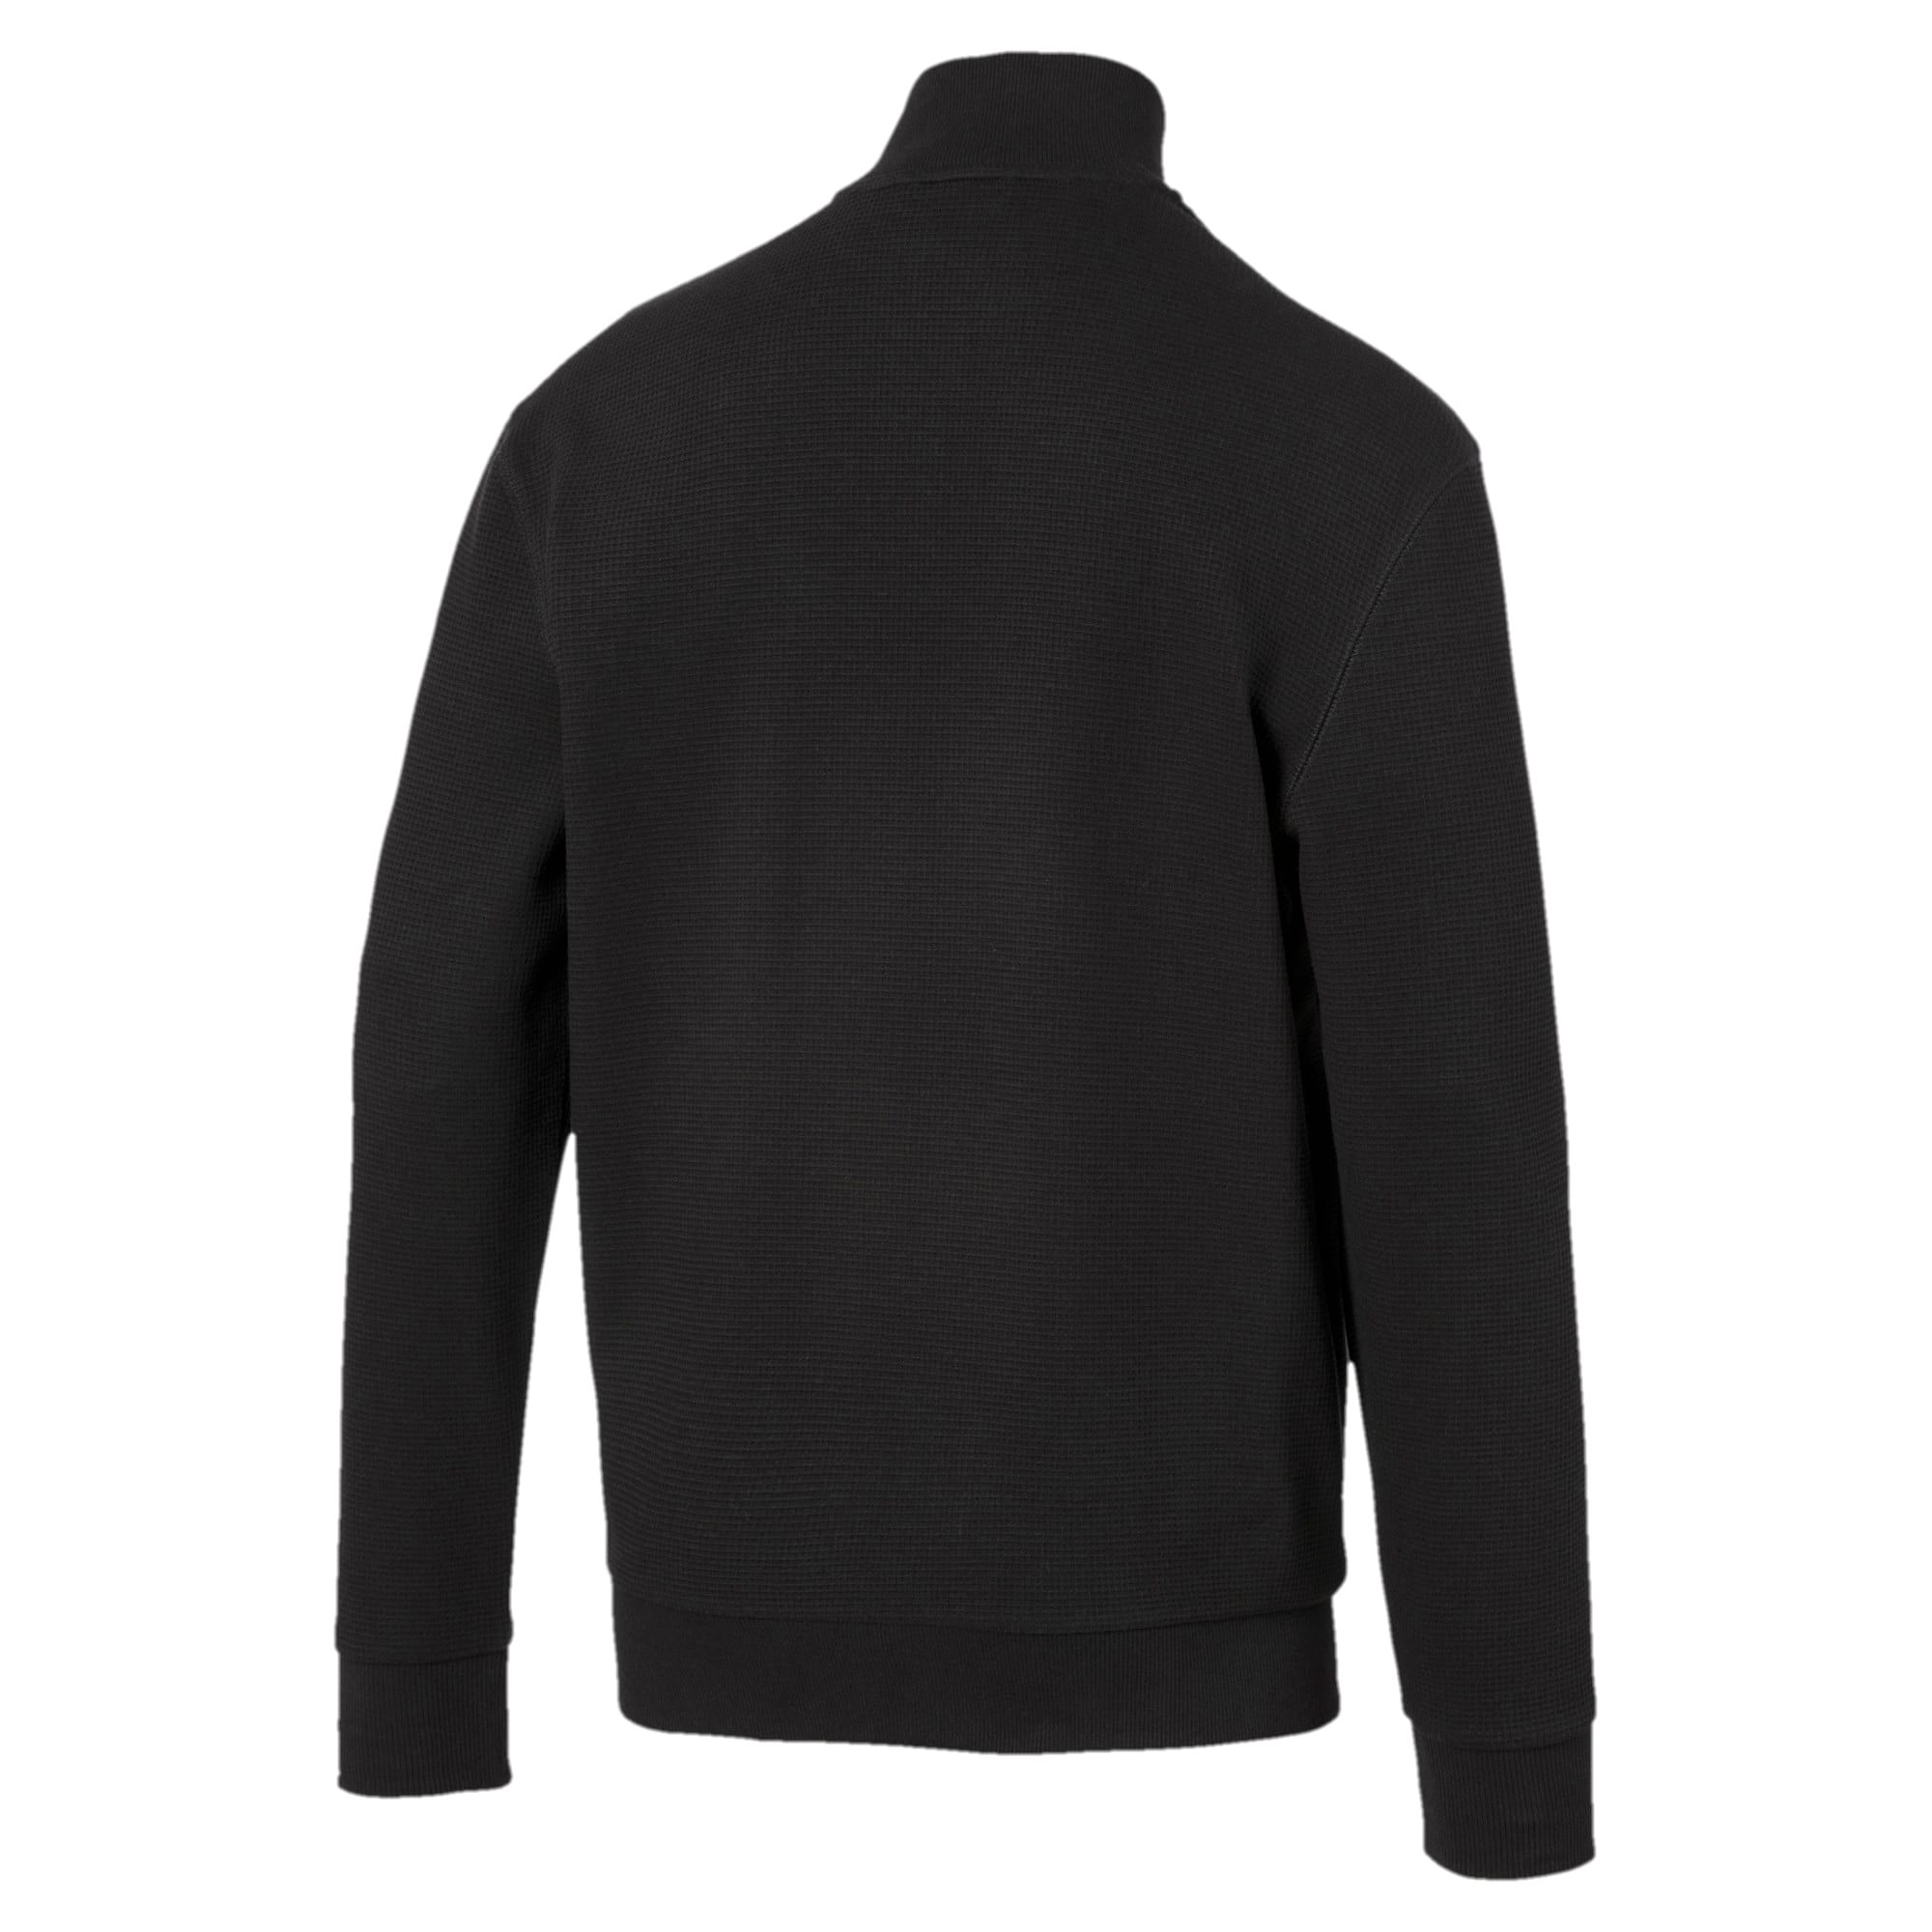 Thumbnail 5 of Fusion Men's Jacket, Puma Black, medium